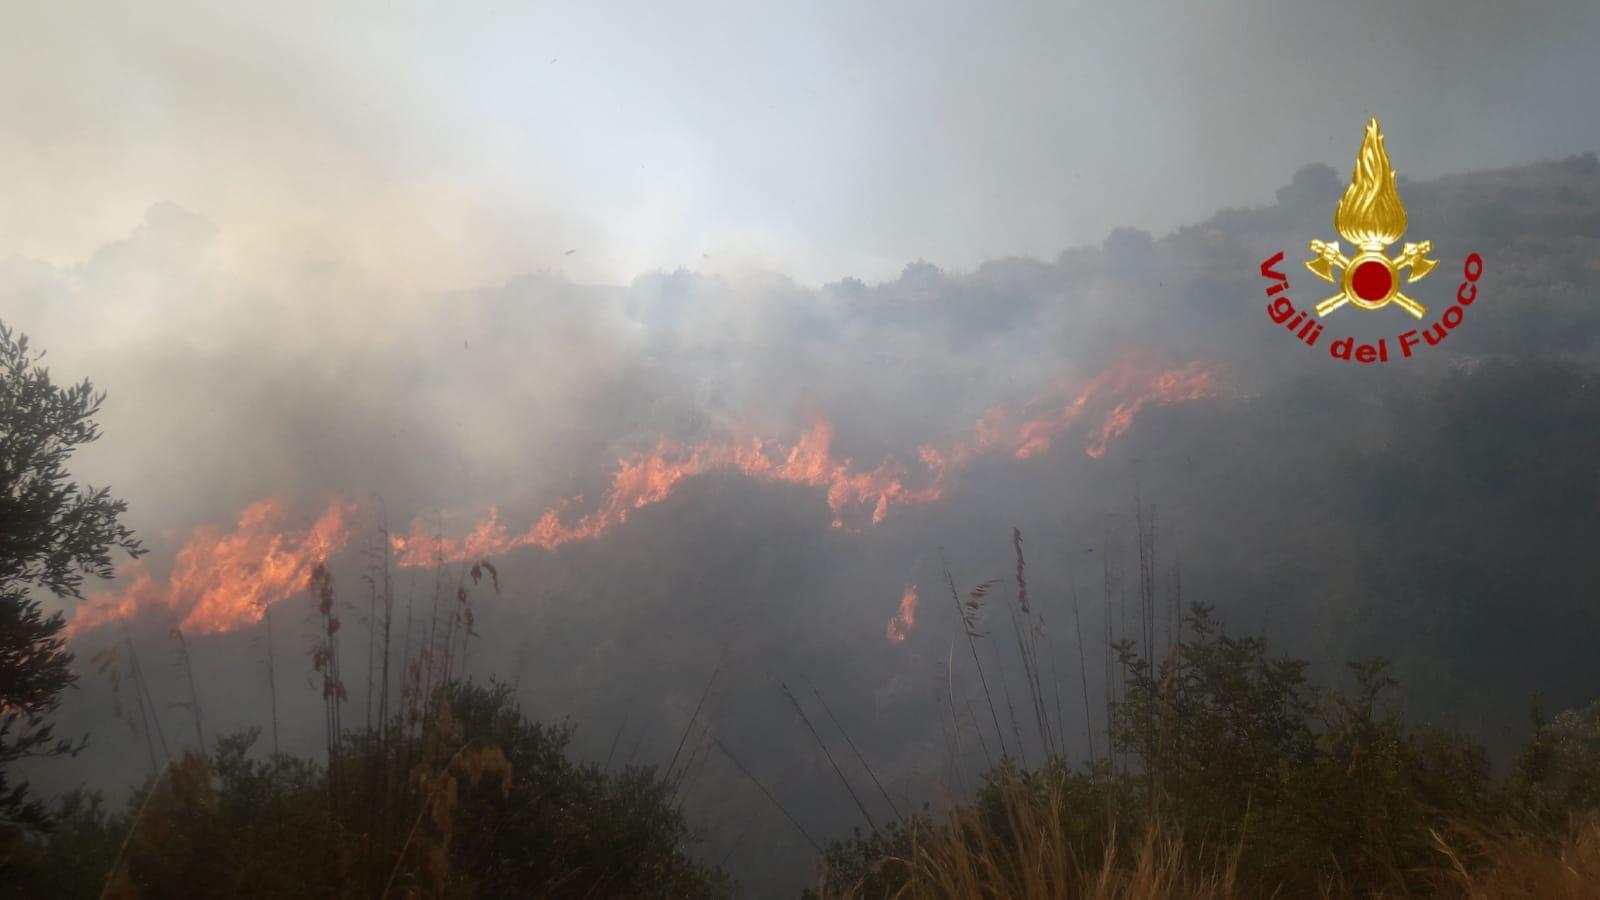 Paura a Noto, pompieri fermano le fiamme